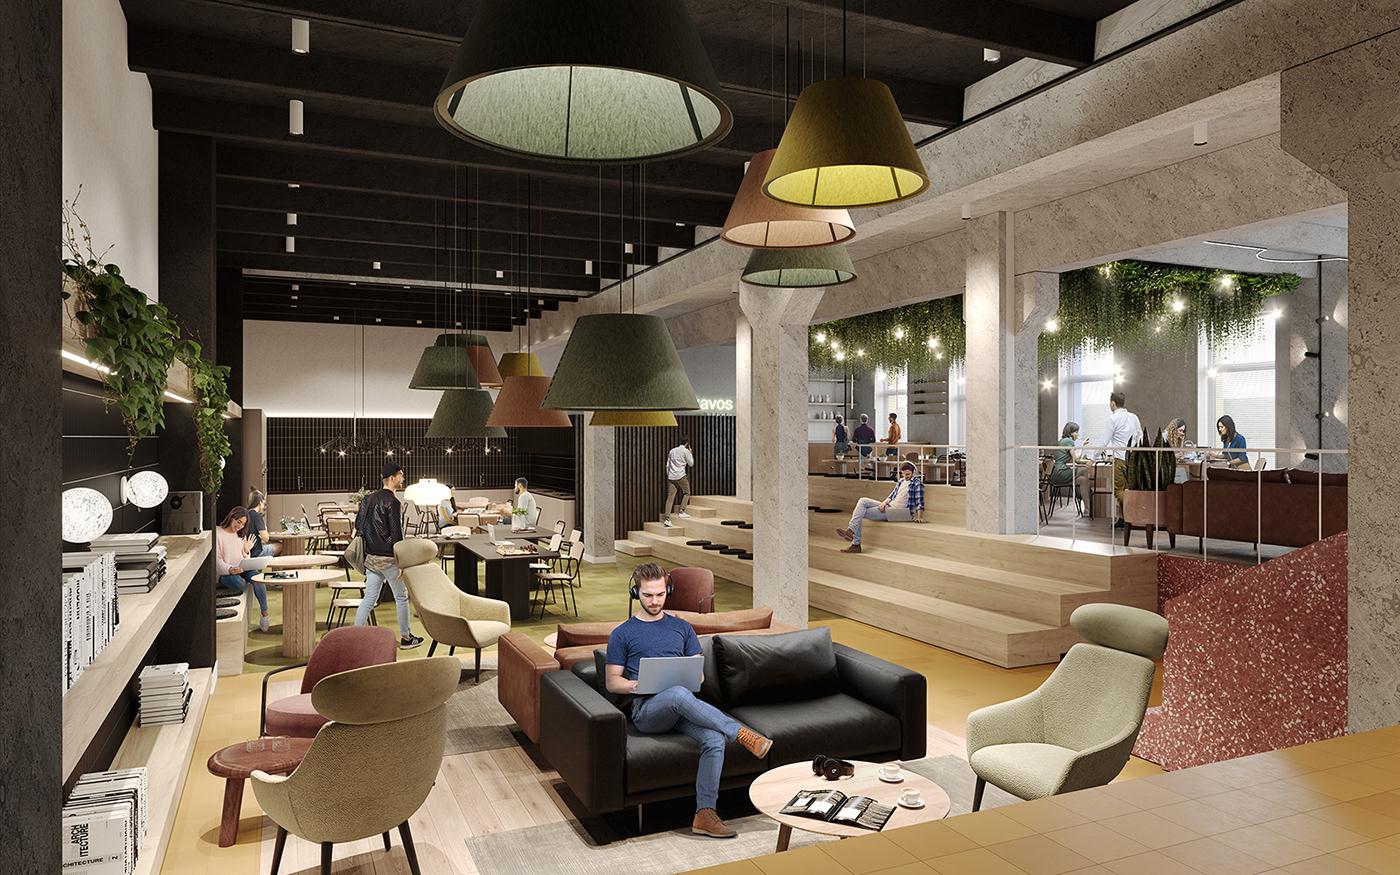 3D architecture archviz CGI digital illustration Interior Render visualization co-living co-working